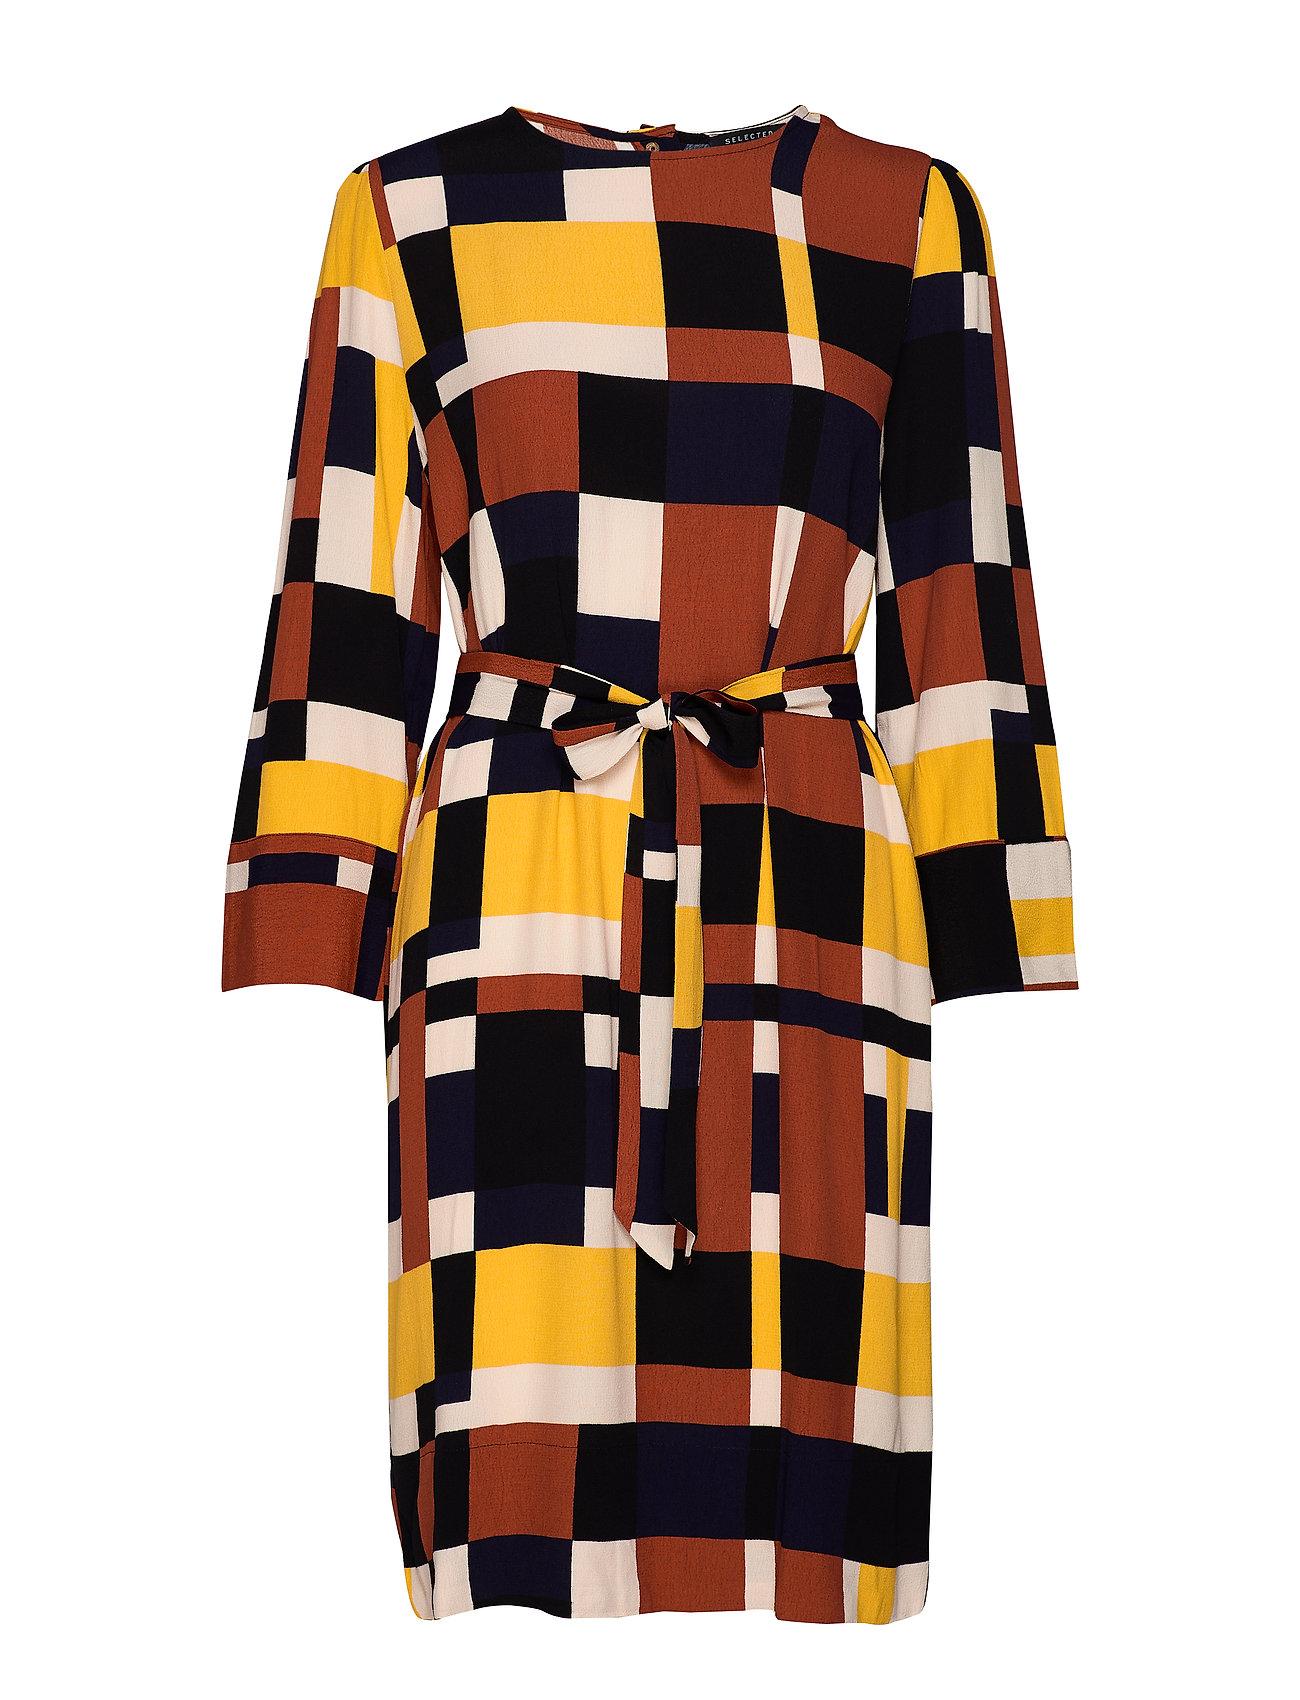 Selected Femme SLFHADLEY-TUNNI 7/8 AOP SHORT DRESS B - GINGER BREAD